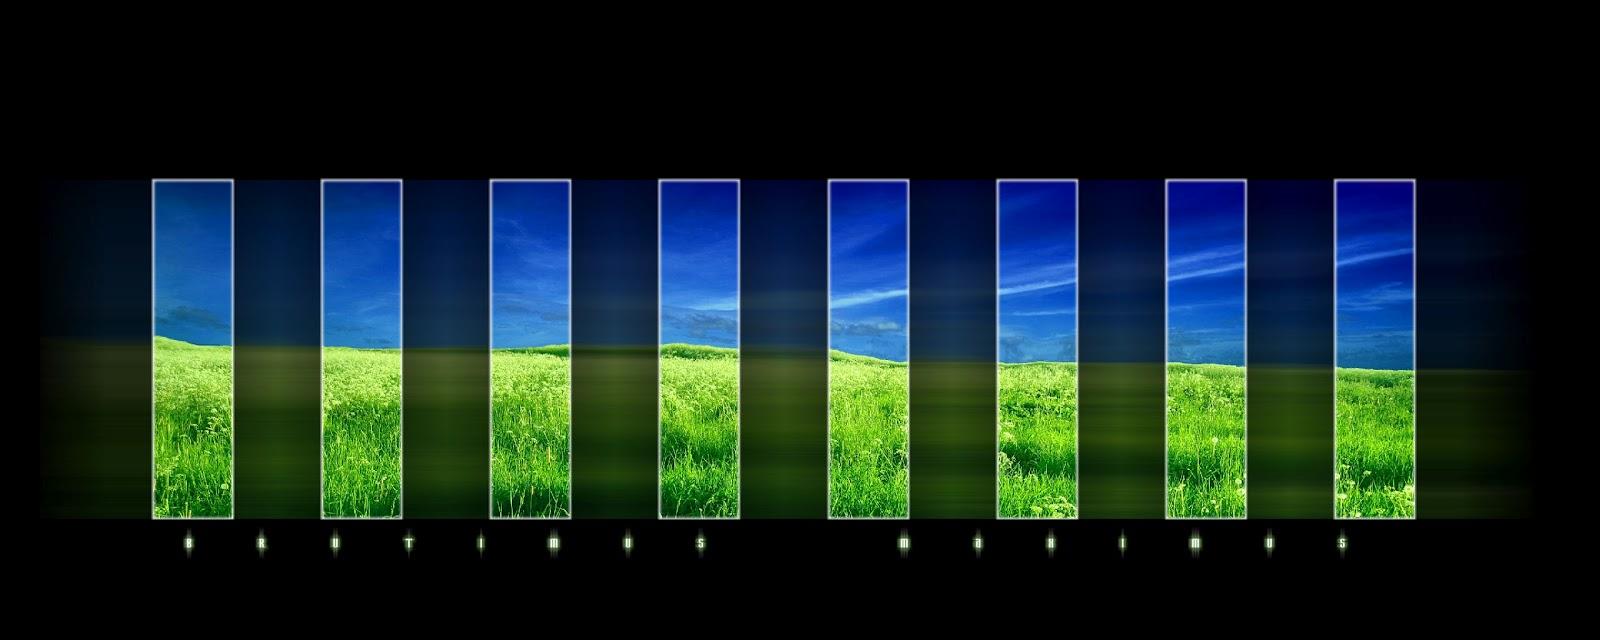 Dual Monitor Wallpaper Windows 7 Dual Monitor Wallpaper Windows 1600x640